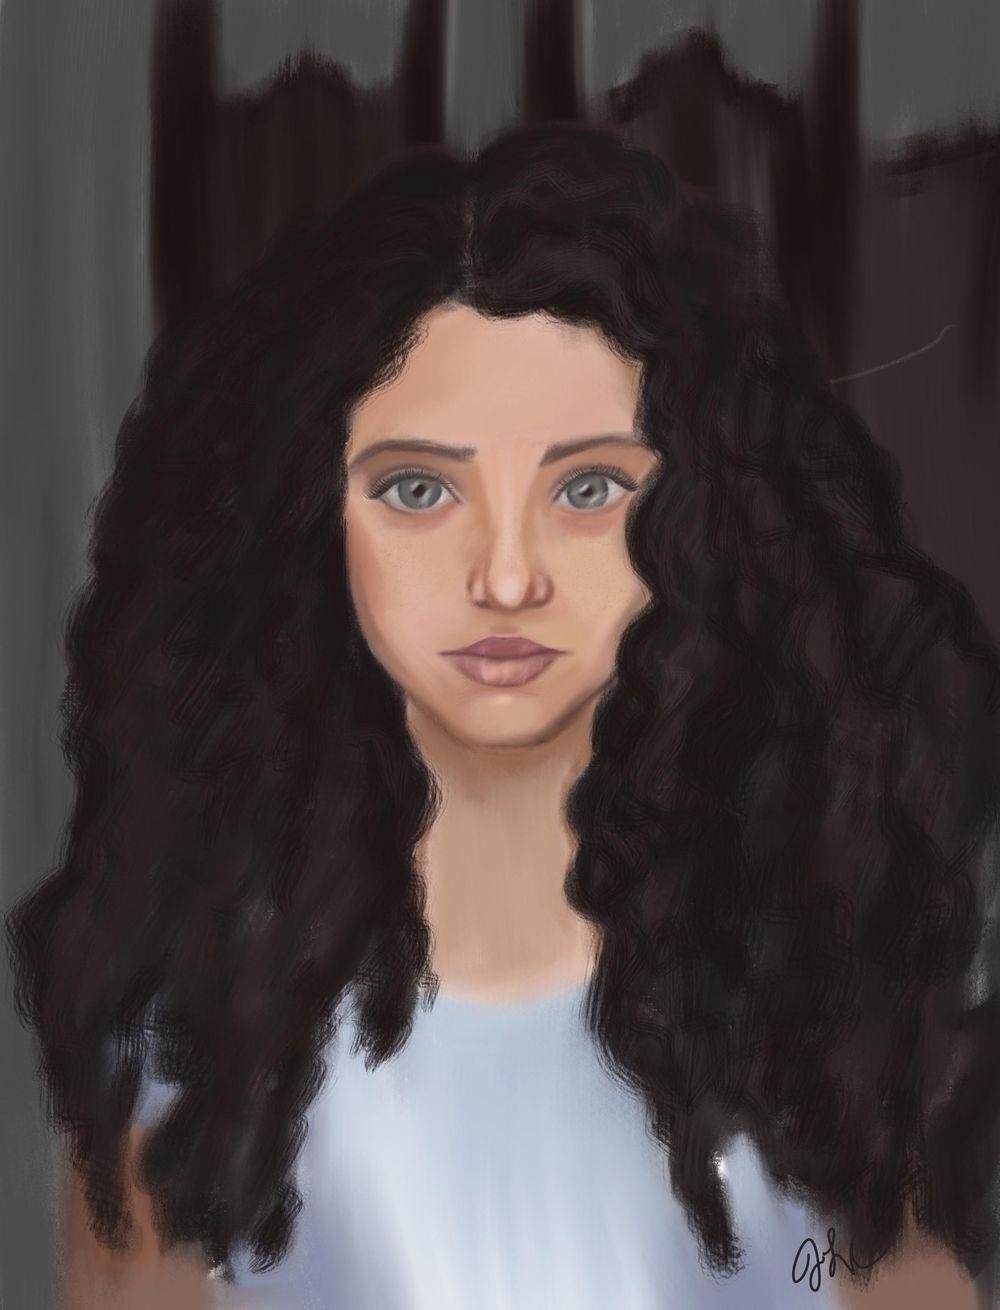 Portrait painting - image 1 - student project